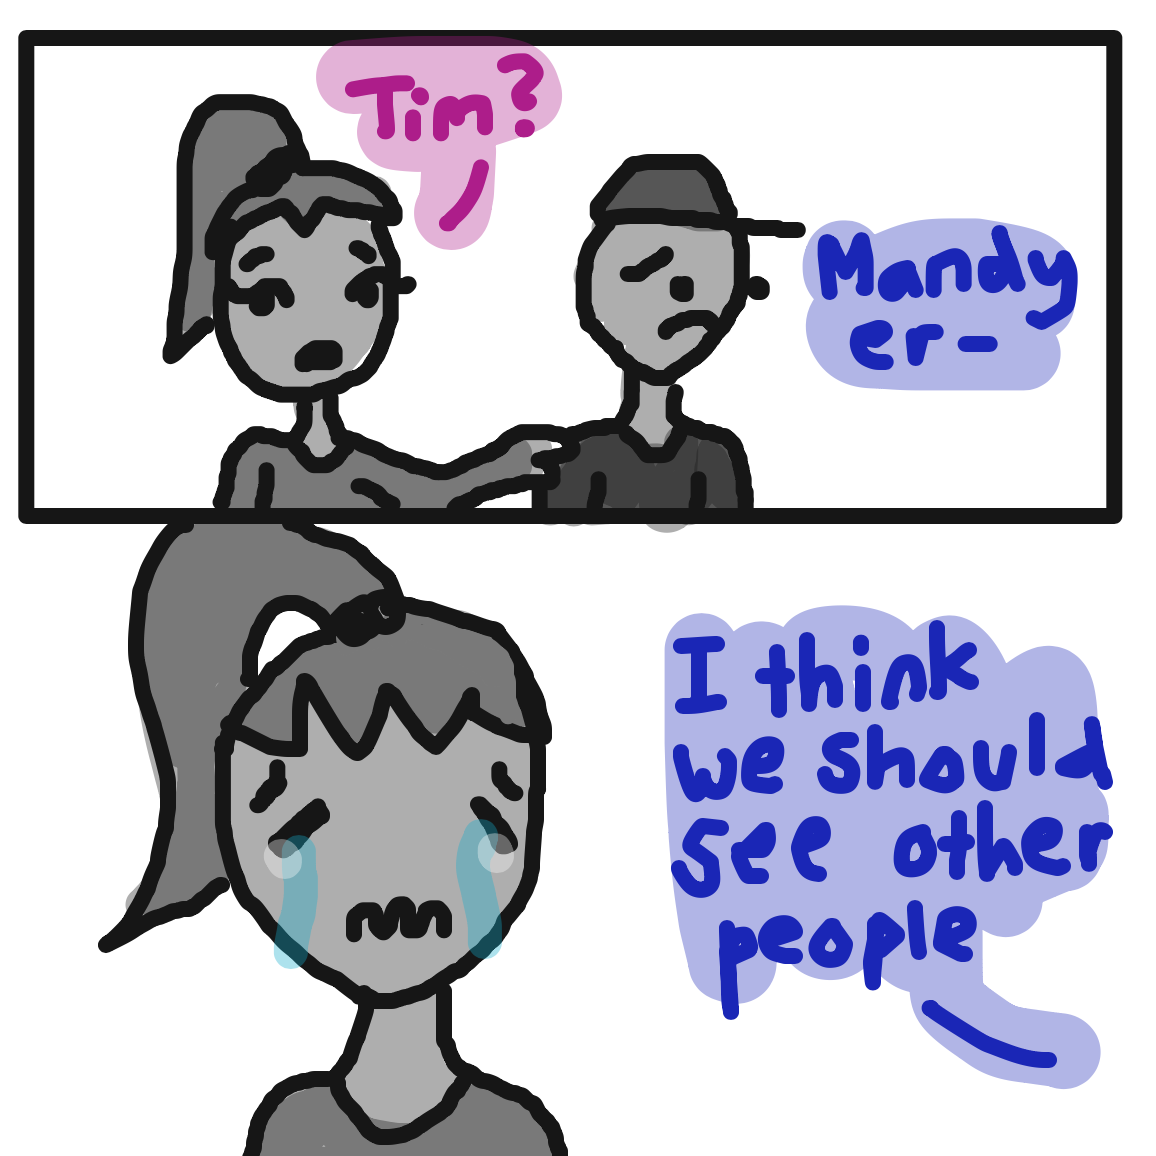 lol - Online Drawing Game Comic Strip Panel